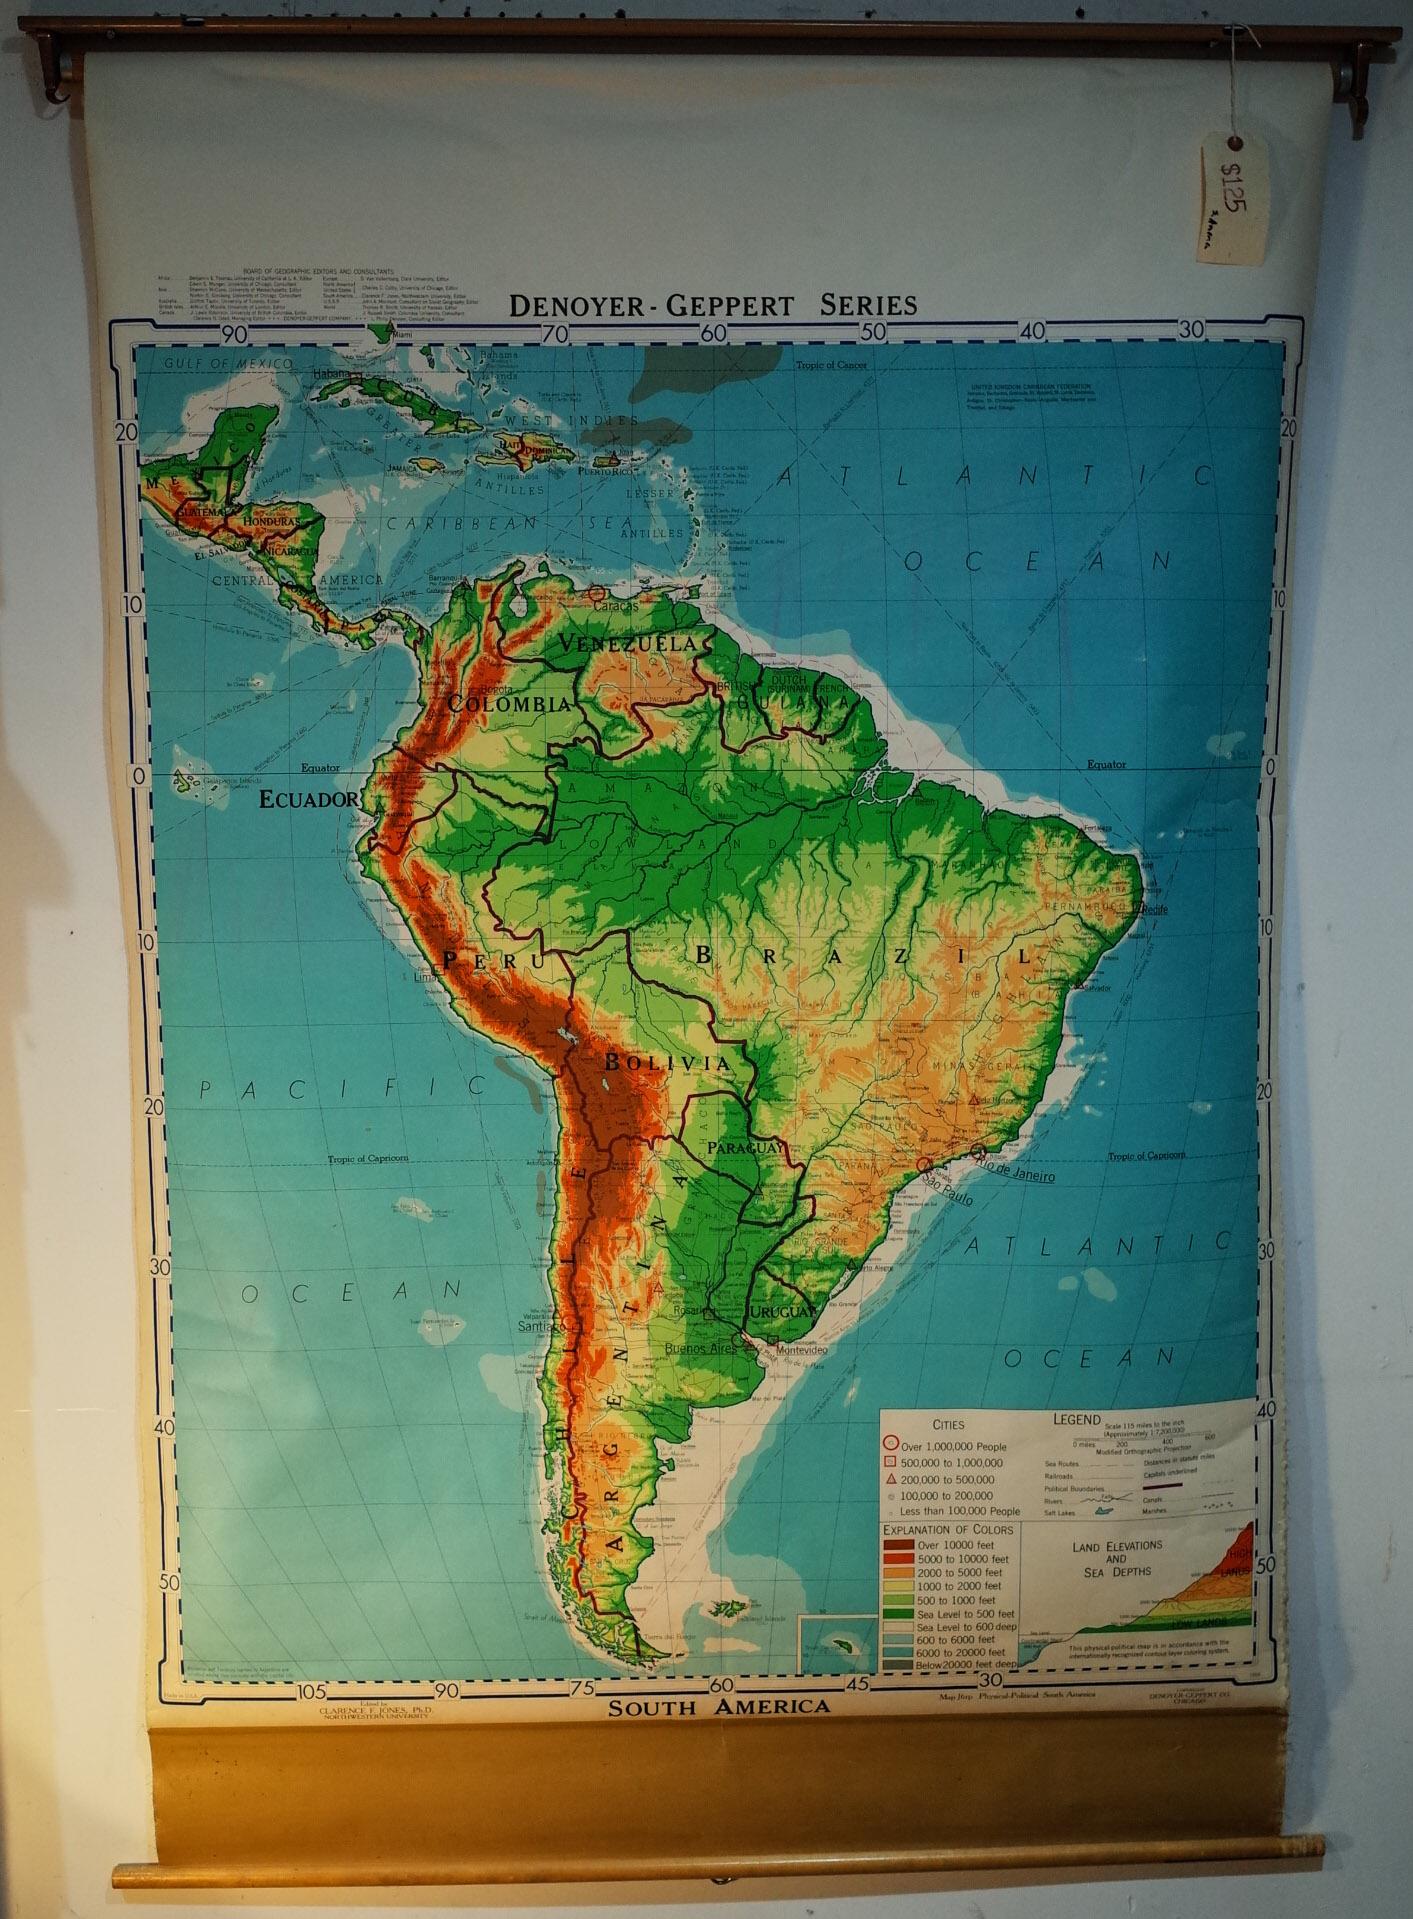 south-america-map.jpg